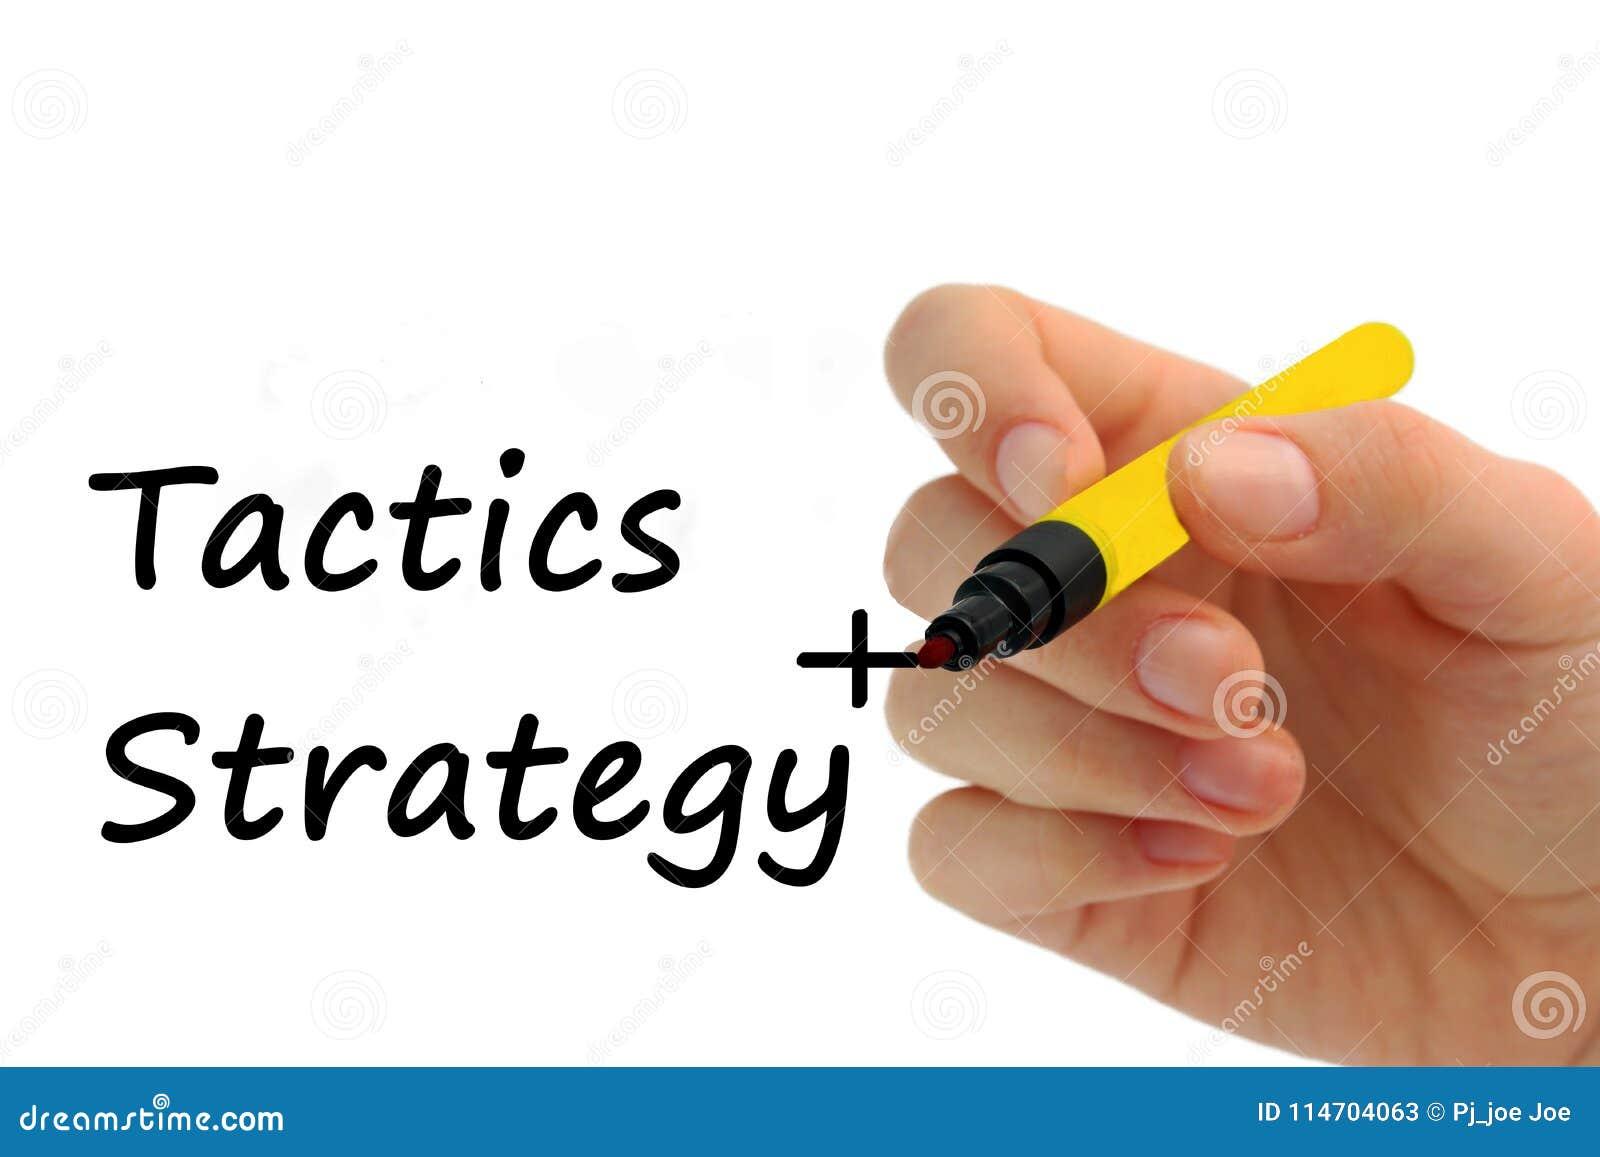 Handhandstilstrategi plus taktik på den genomskinliga wipebrädebussen